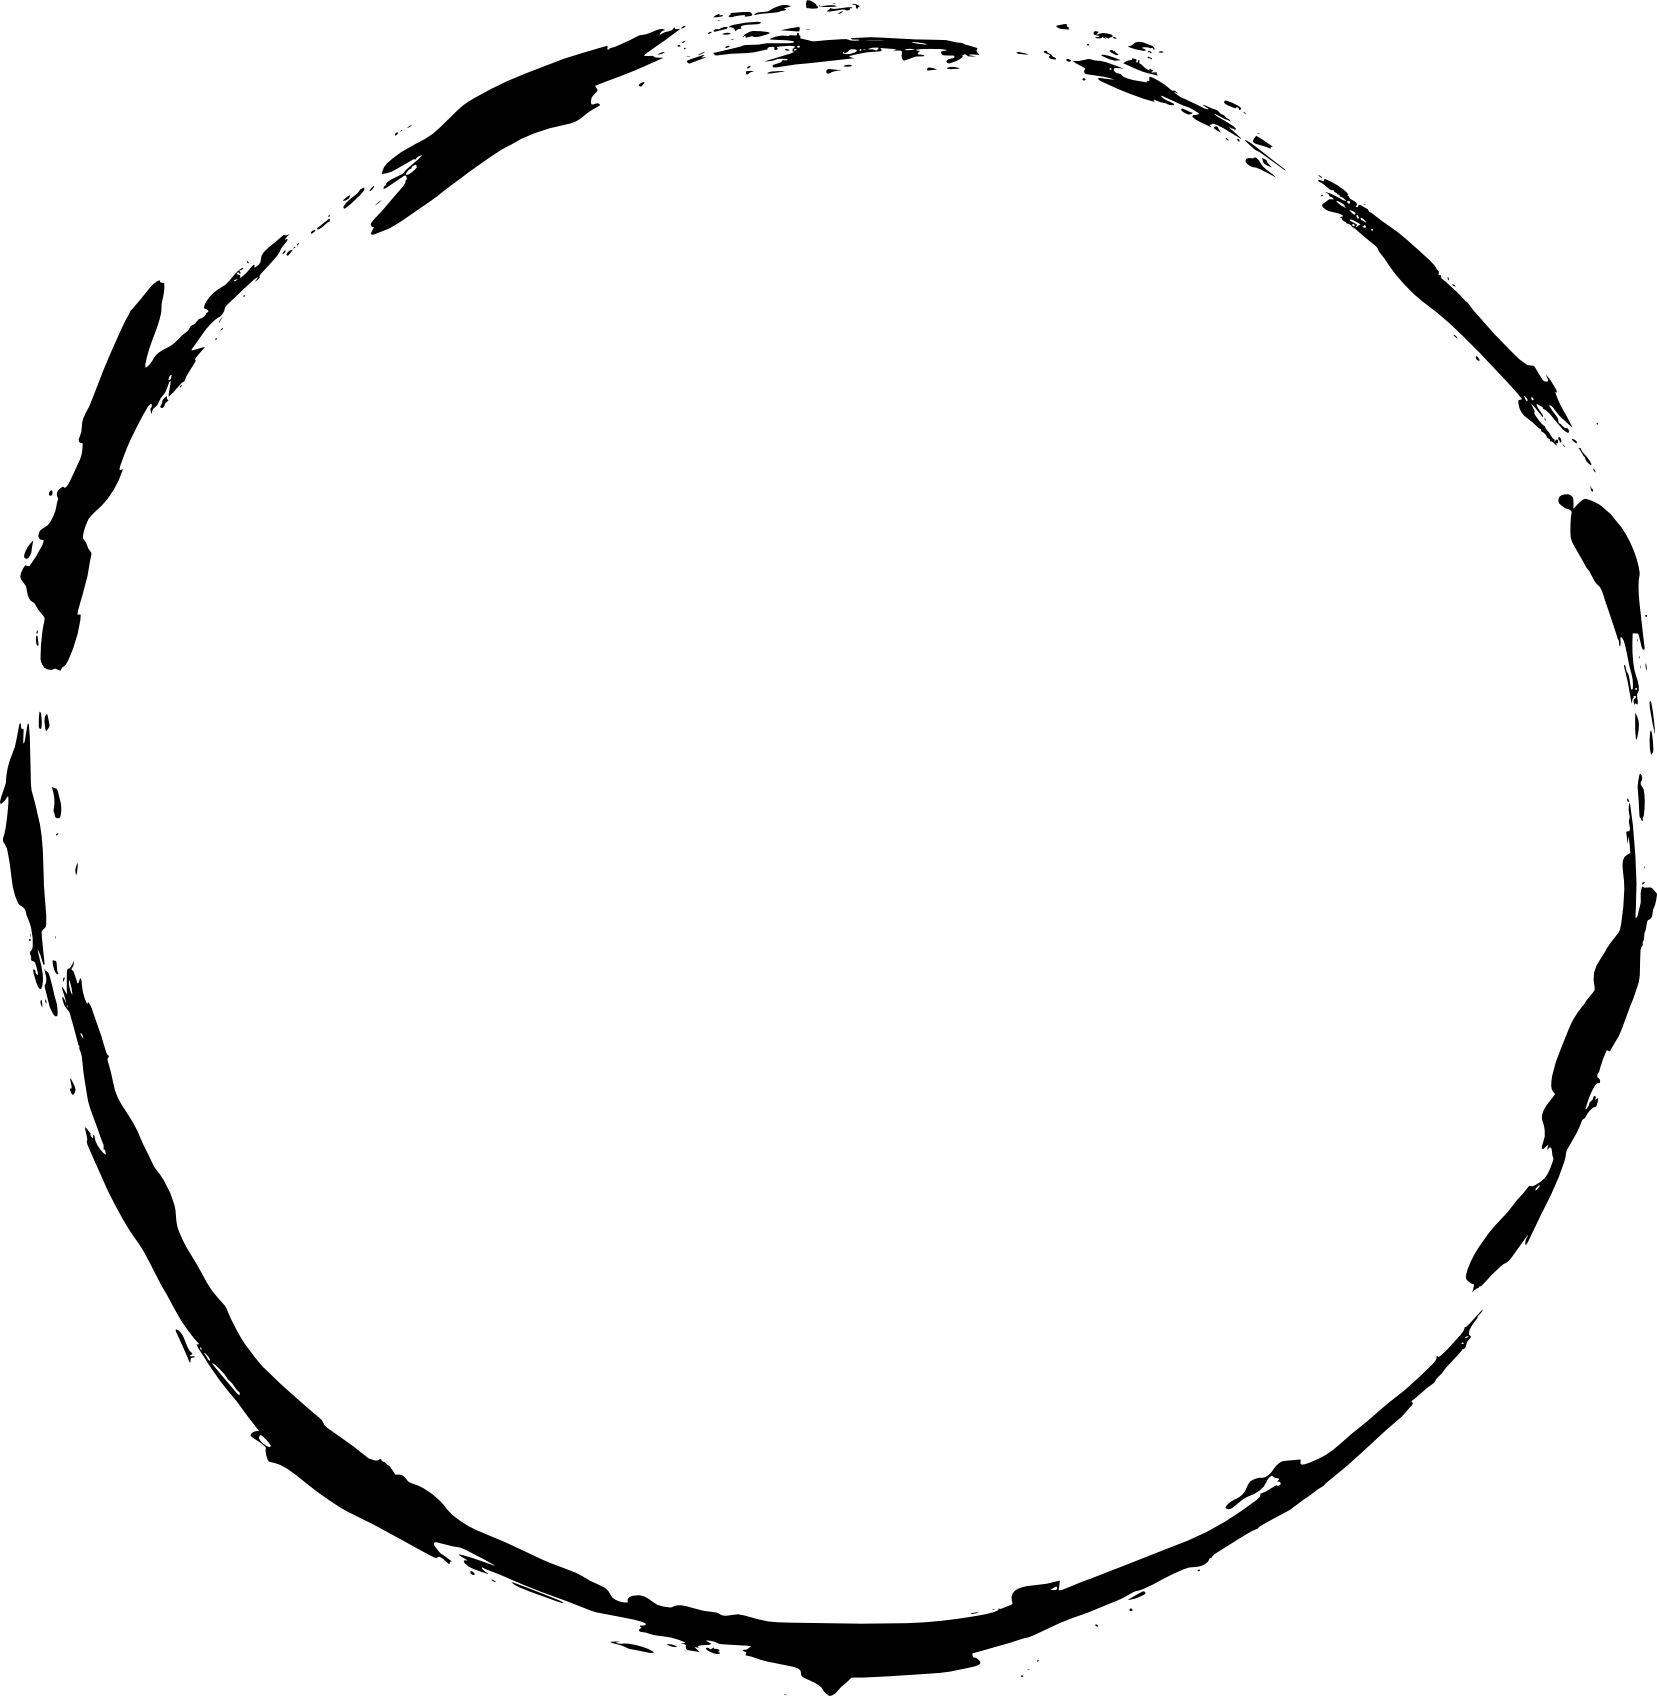 6 Grunge Circle Frame (PNG Transparent) | OnlyGFX.com